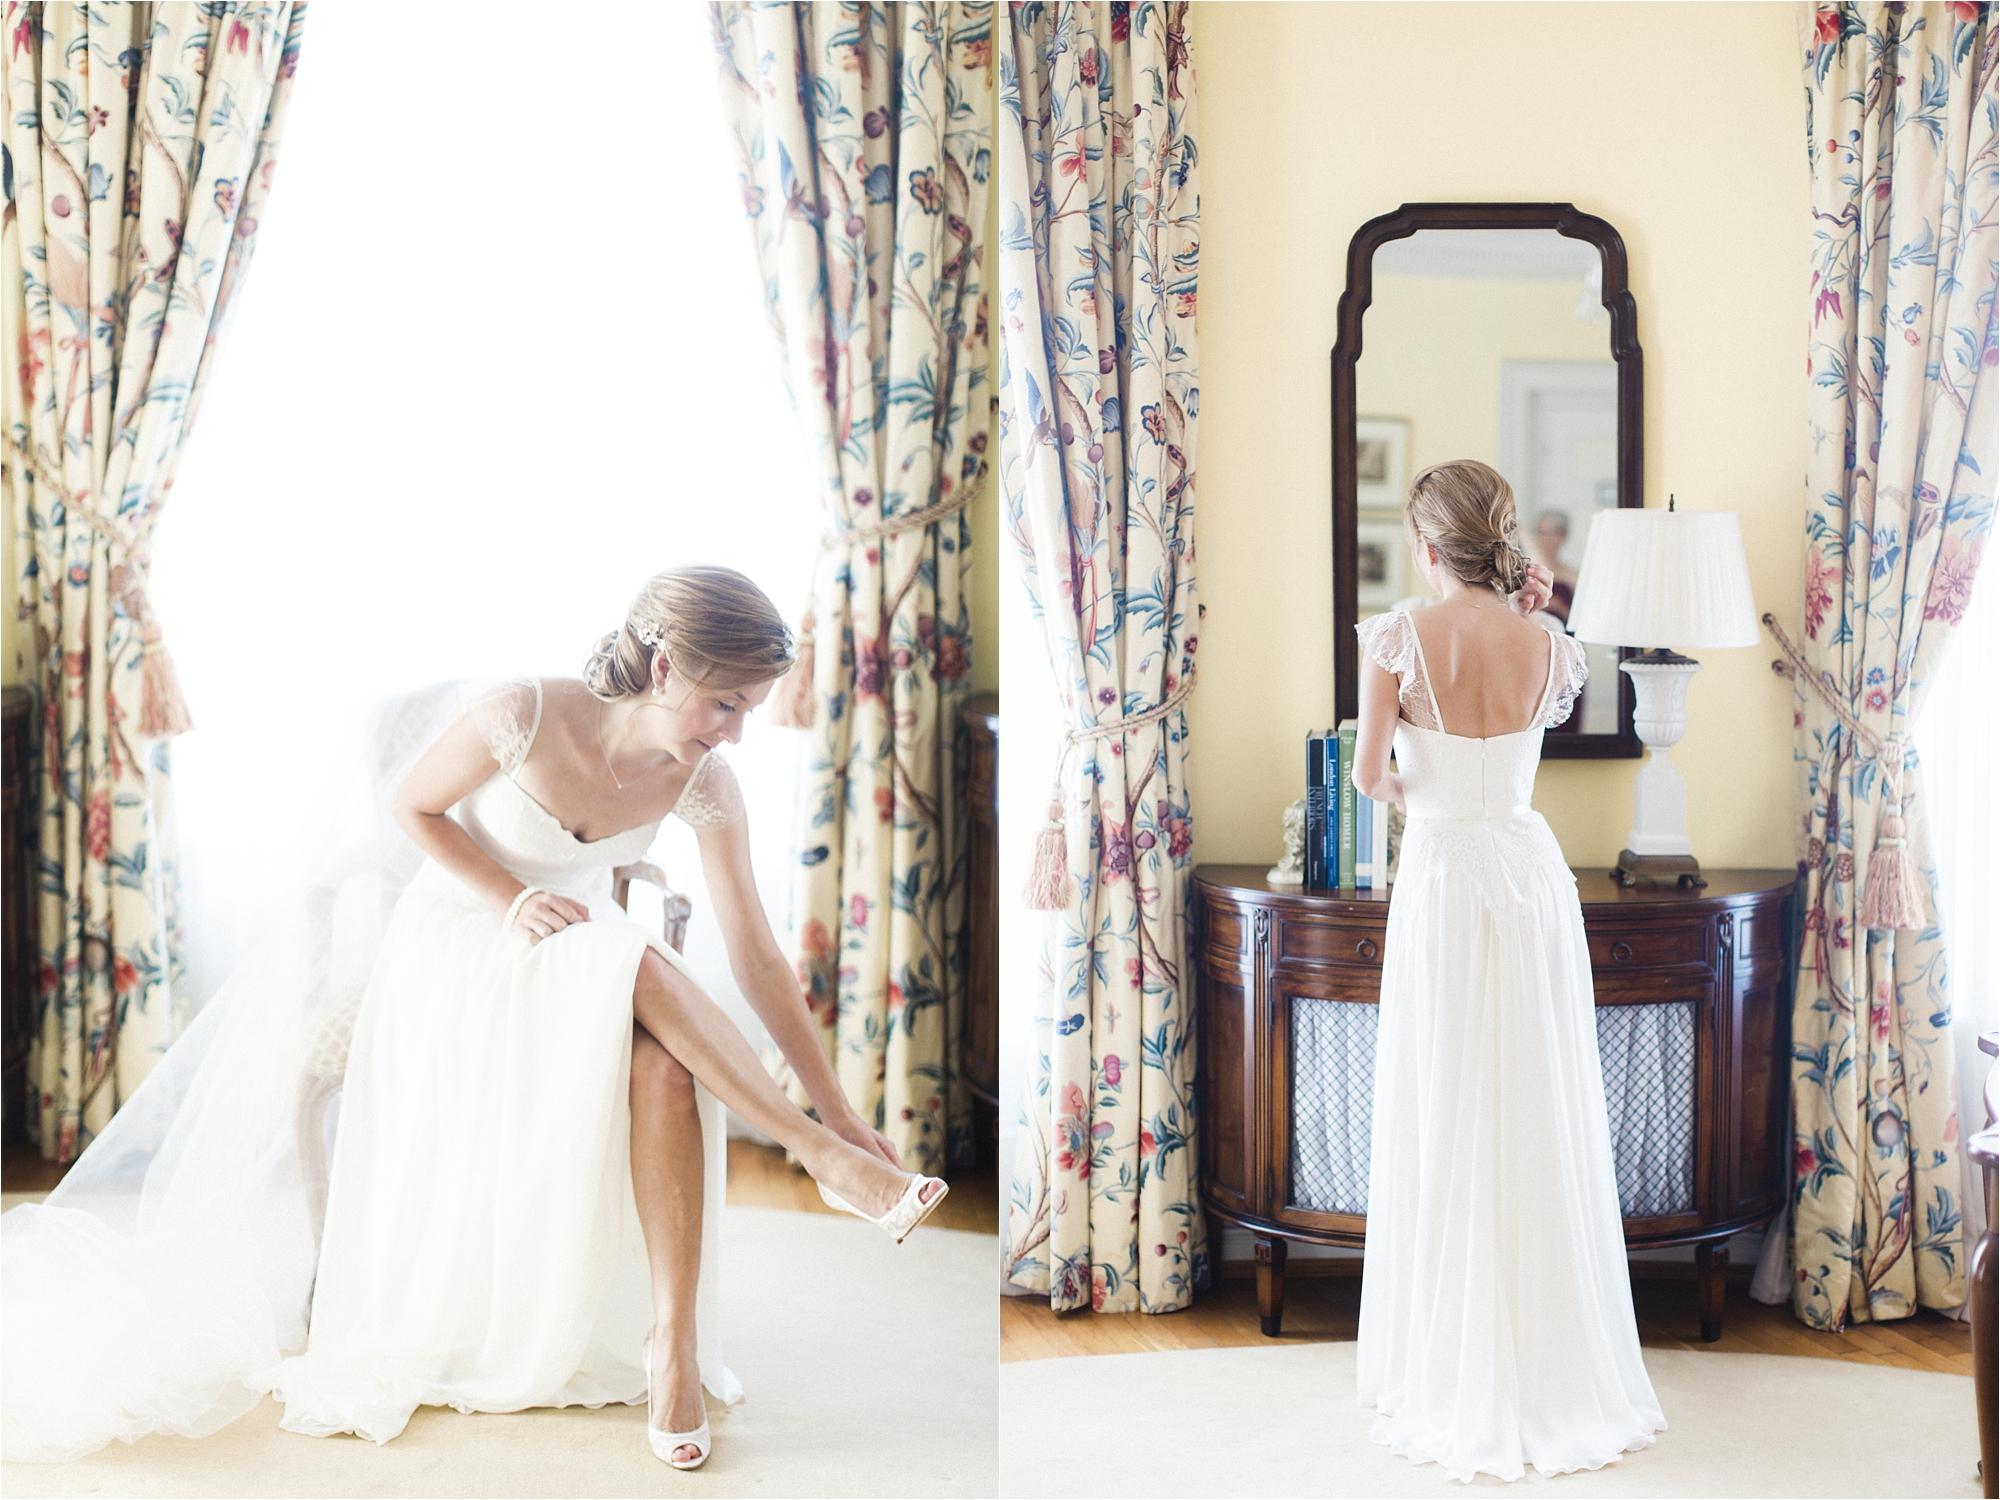 stephanie-yonce-photography-elegant-private-club-washington-dc-wedding-photos_0004.jpg